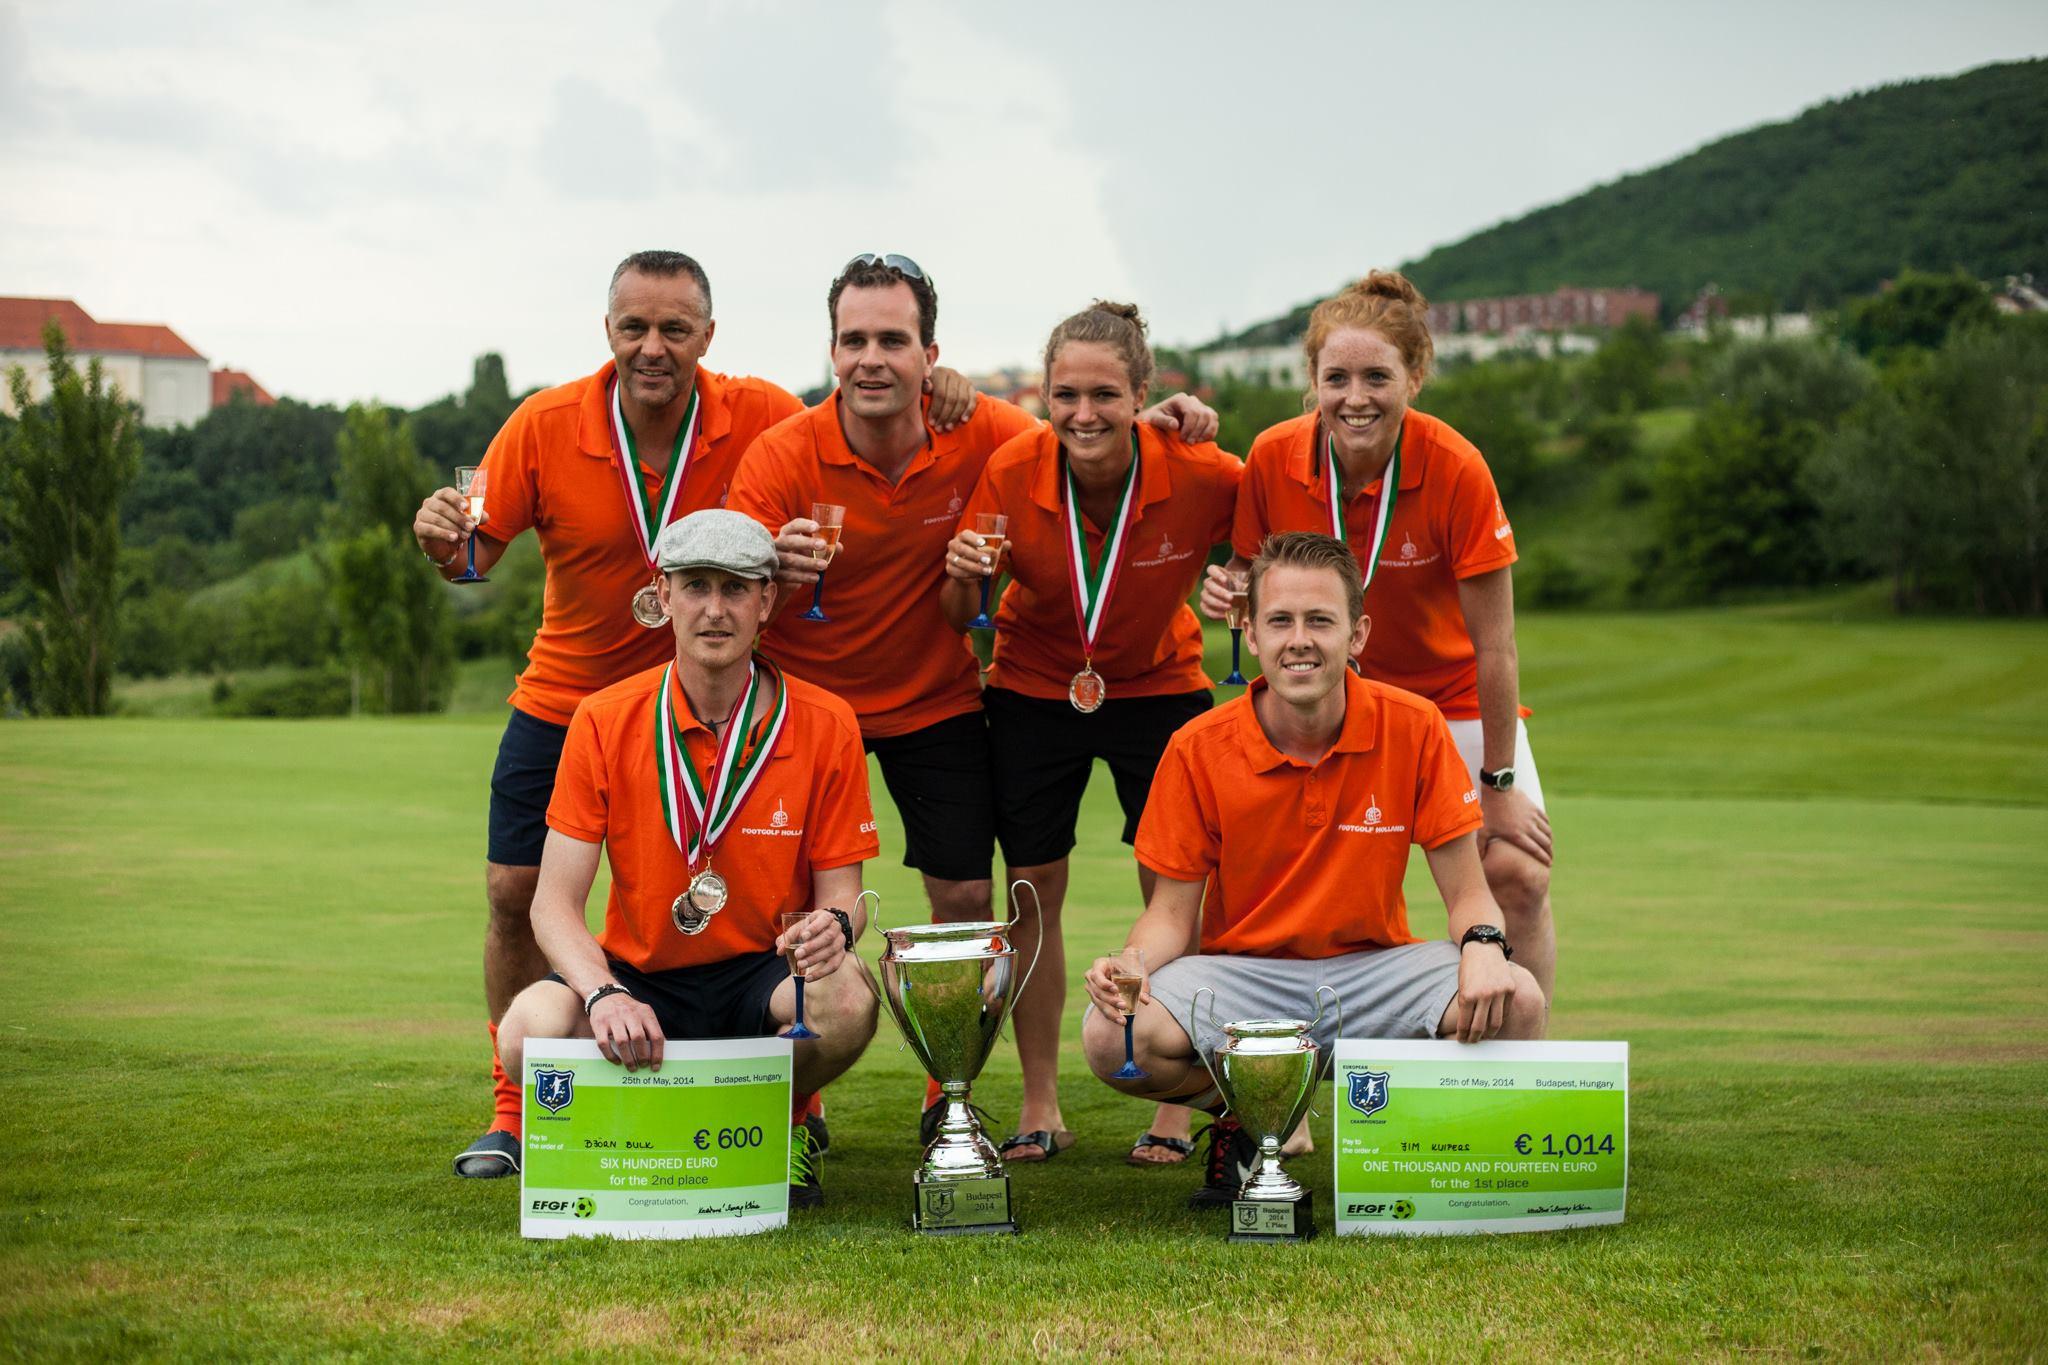 efgf-footgolf-europa-championship-budapest-2015-6